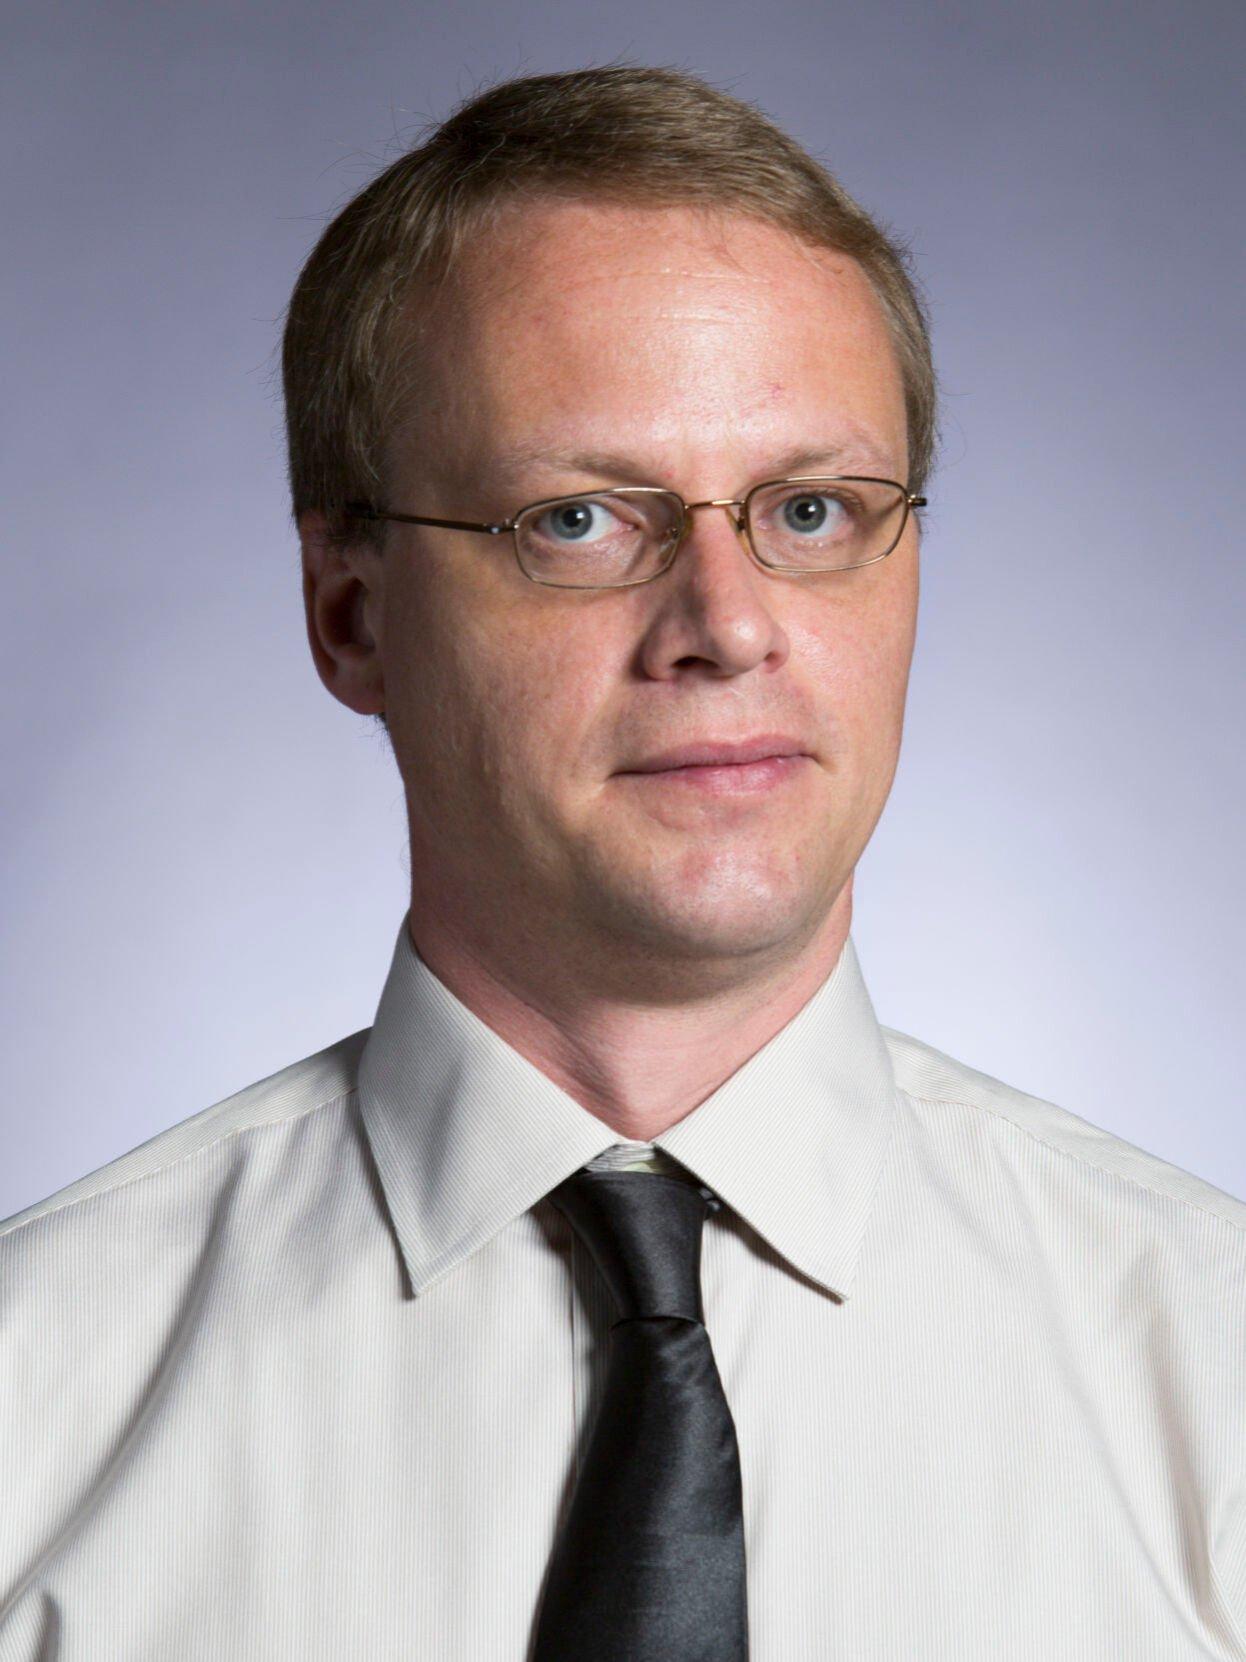 Thomas Zolper